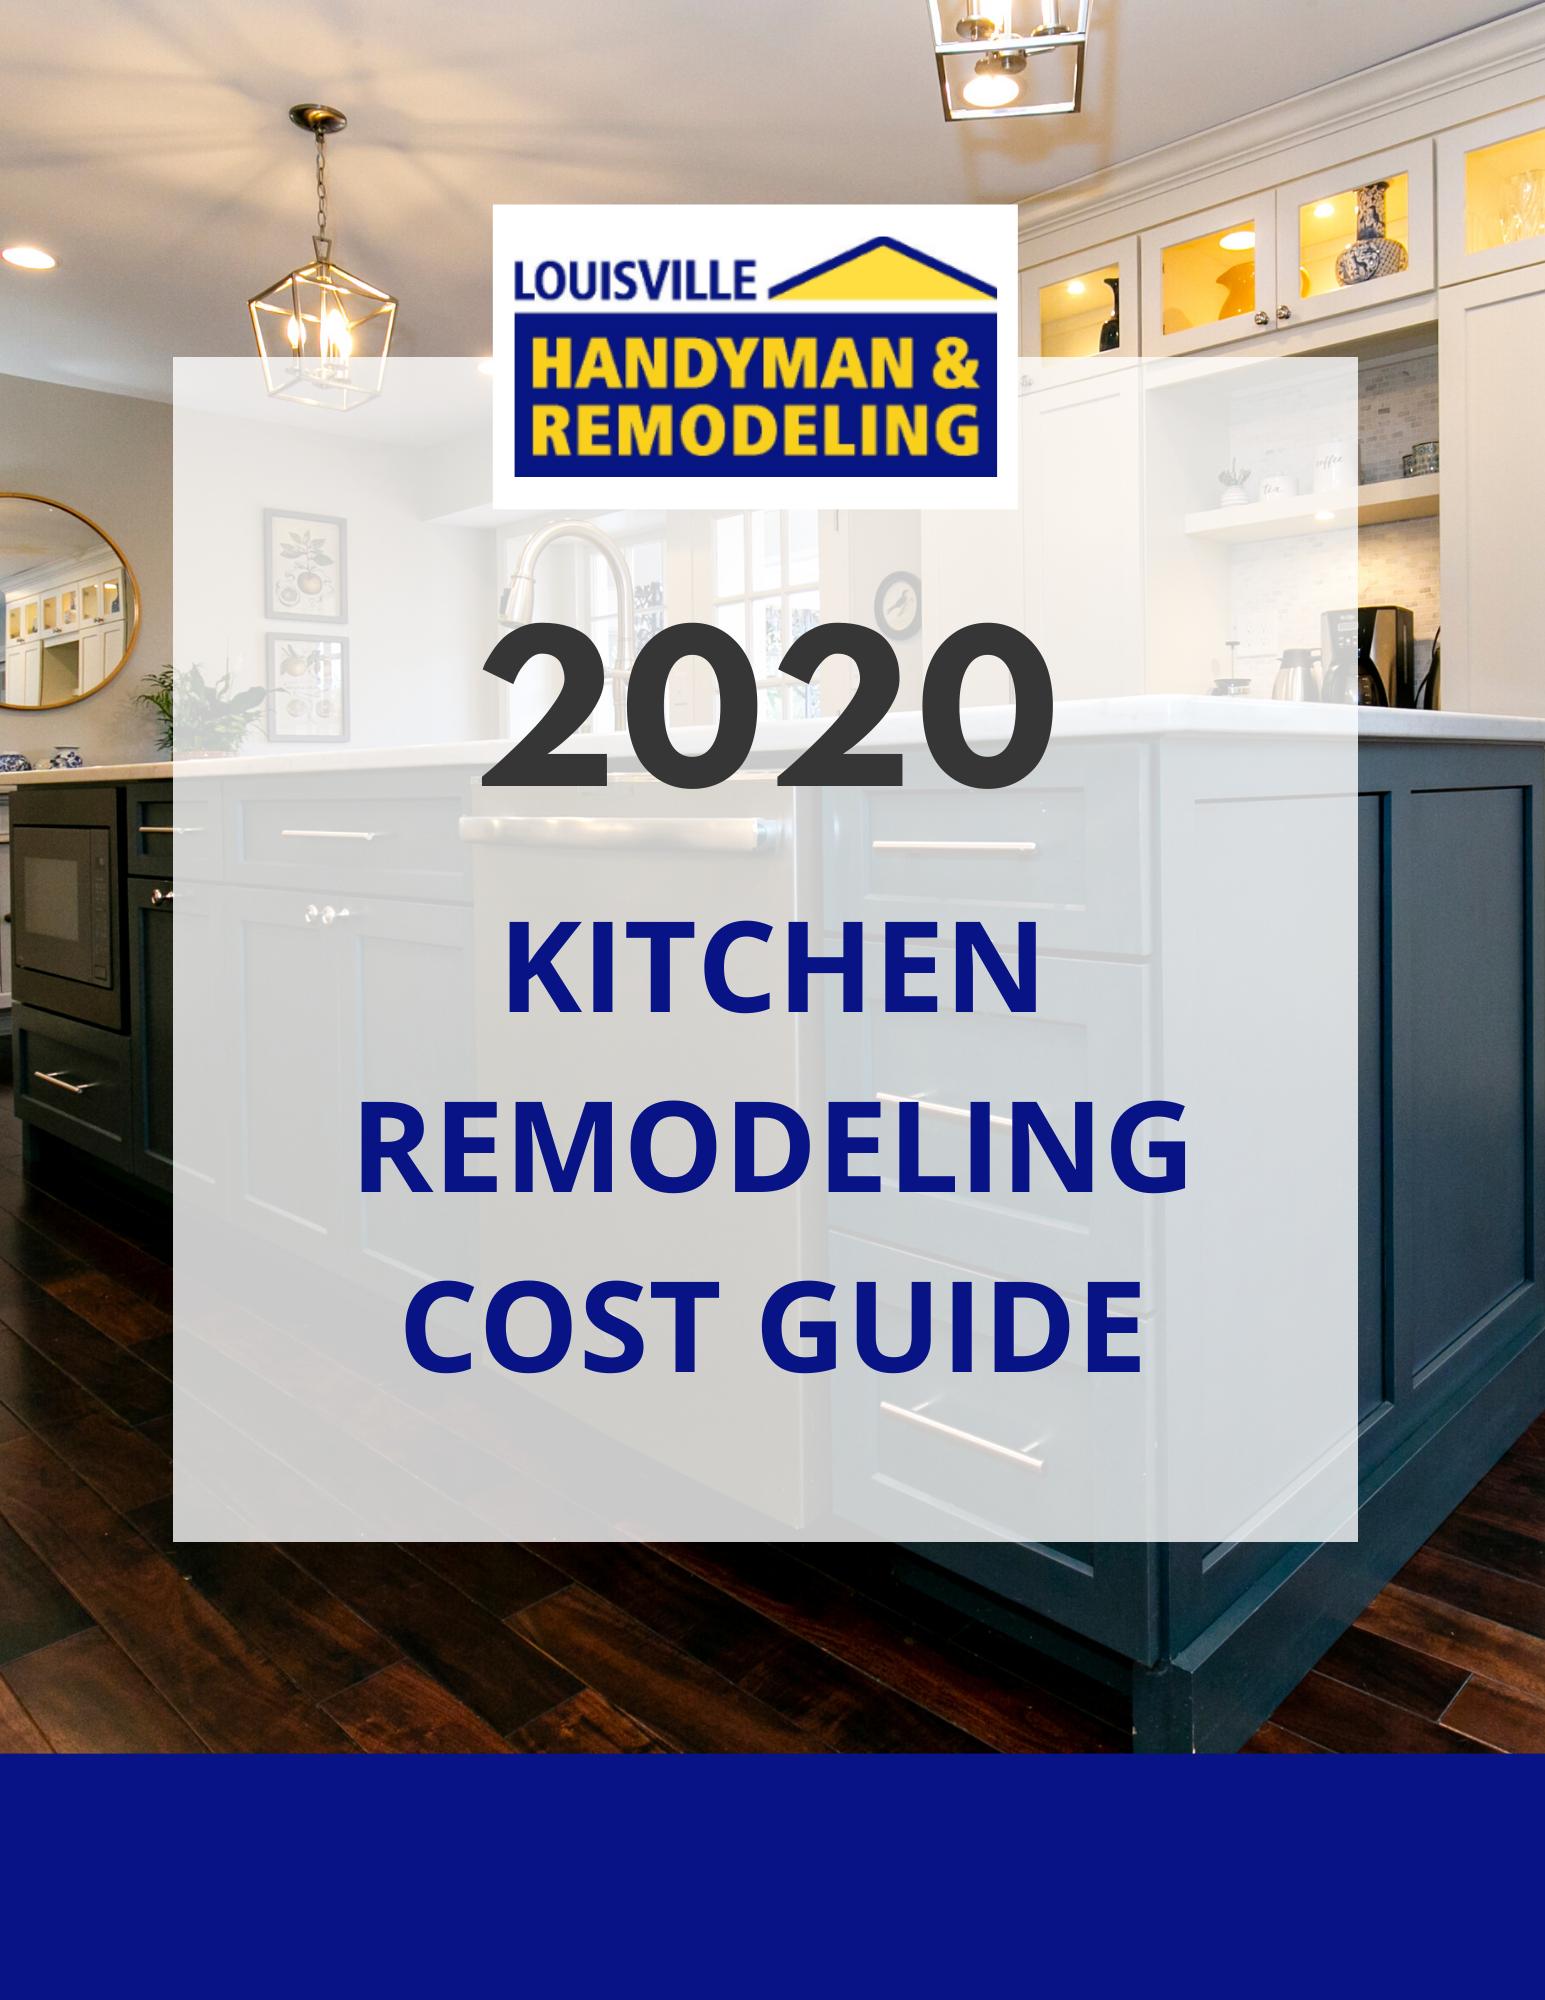 Louisville Handyman Kitchen Cost Guide